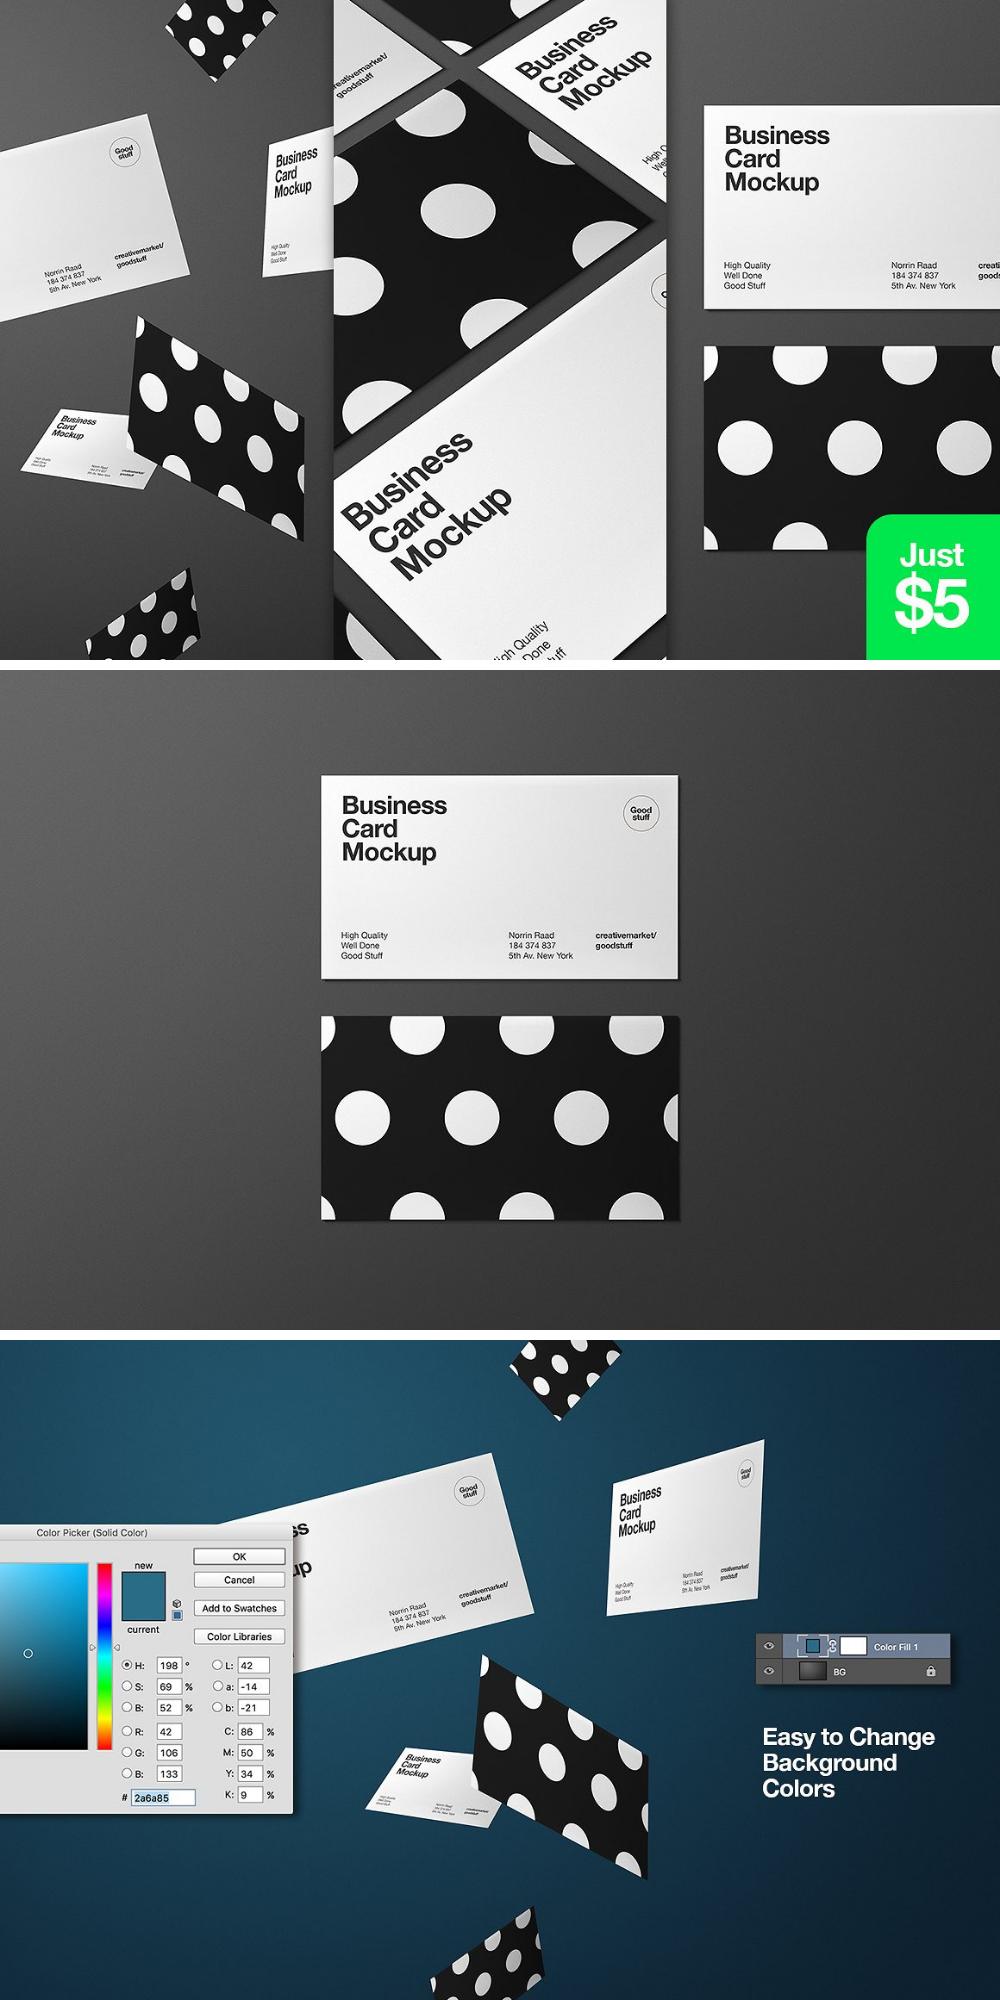 Mockup Für Visitenkarten Geschäftsausstattung